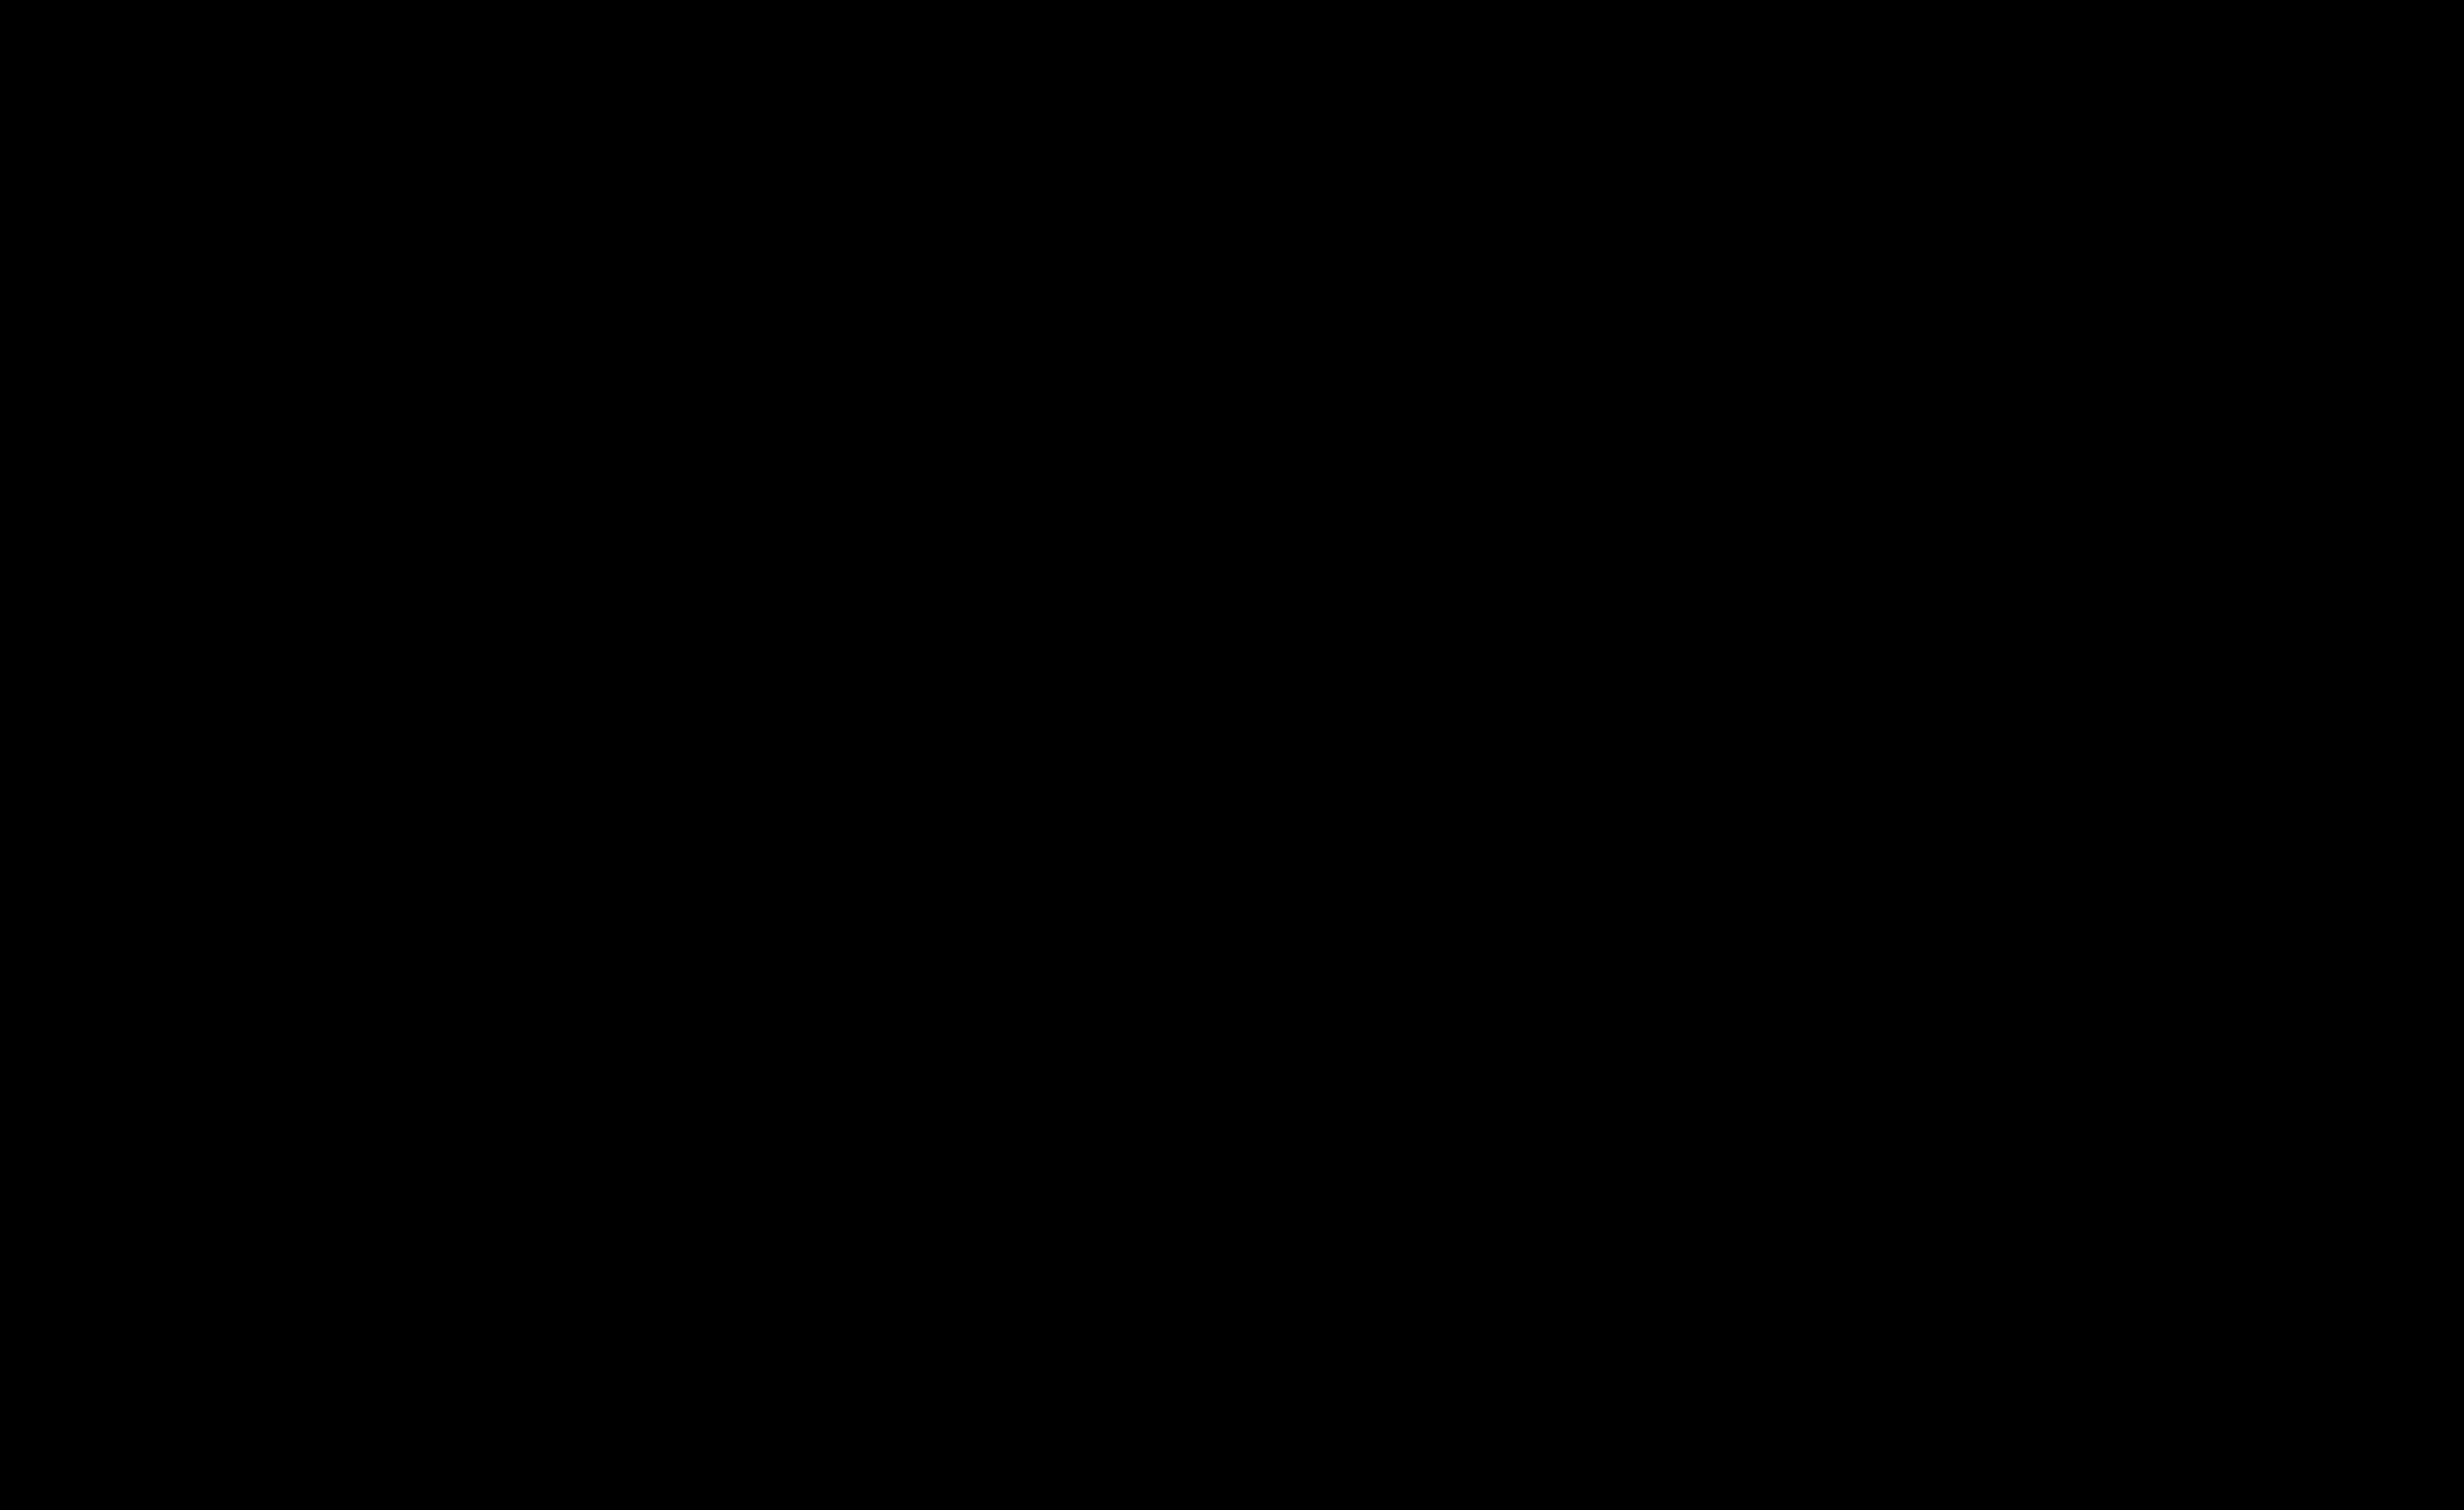 Carboxyfluorescein-dPEG®₂₄-amido-dPEG®₂₄-DSPE